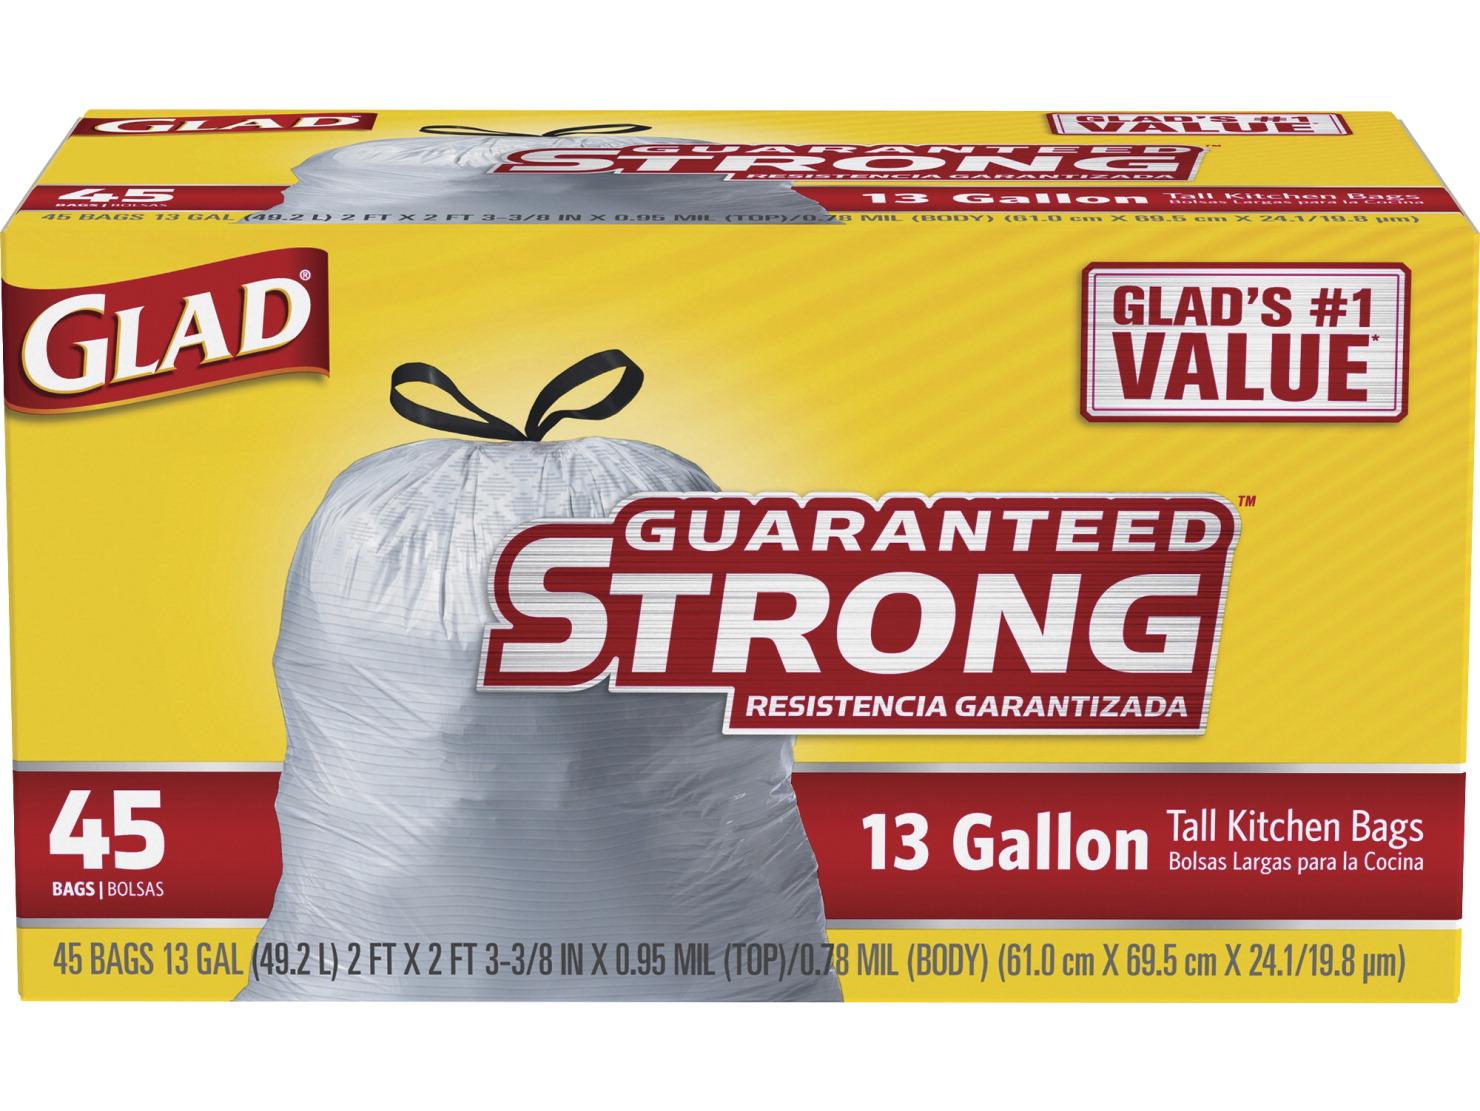 Clorox Glad Strong 13 Gal Tall Kitchen Trash Bags 2 Ft X 2 1 4 Ft X 1 Ml White